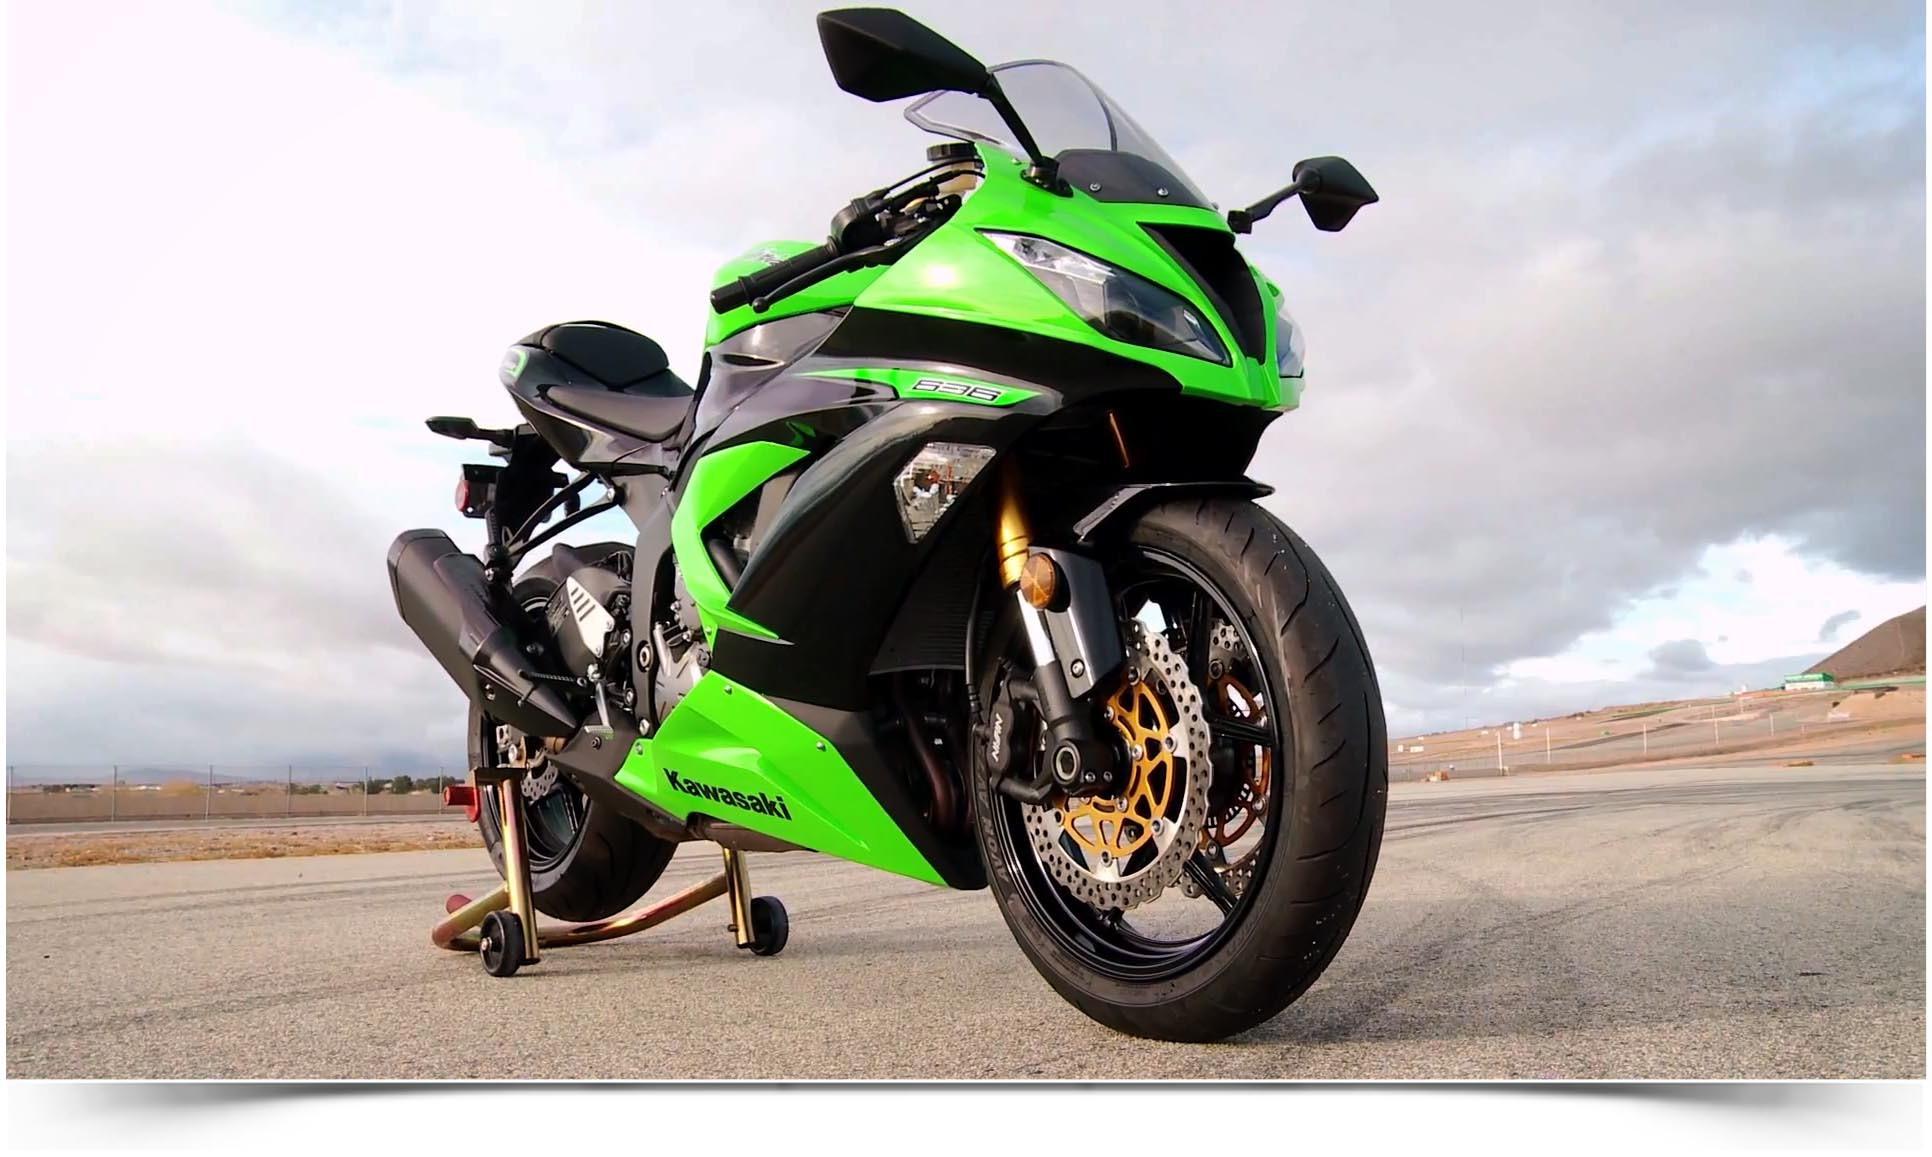 Test Drive A Motorcycle Kawasaki Ninja ZX 6R 636 Performance Wallpapers And Images